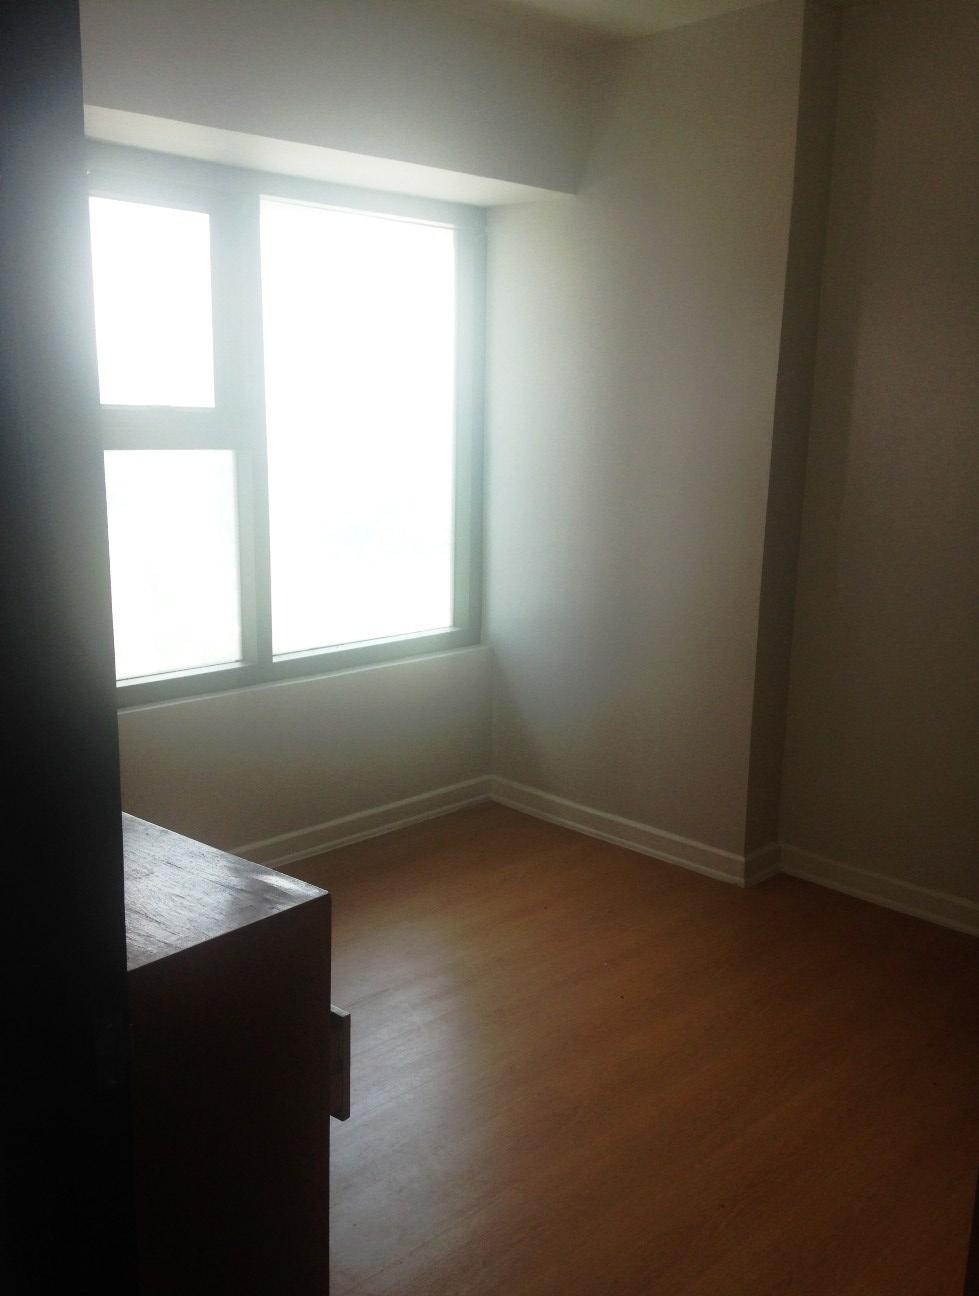 1 Bedroom Studio For Rent: Studio And 1 Bedroom Condominium Units In San Antonio